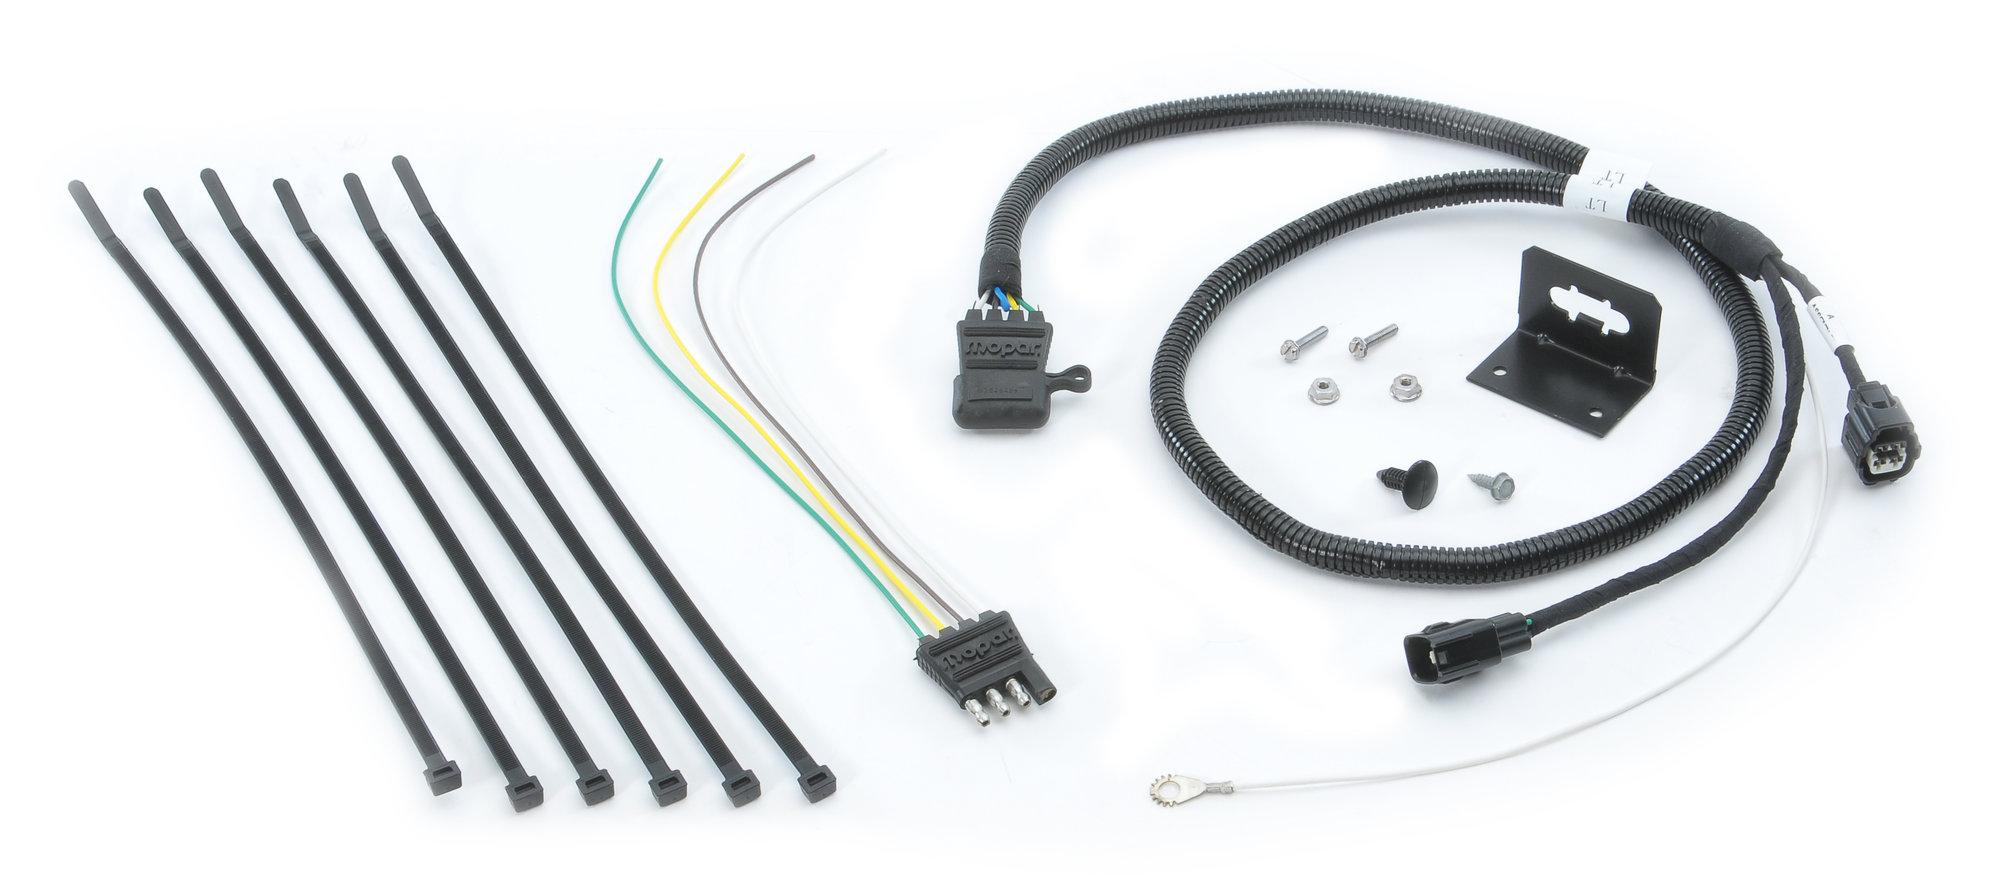 Mopar 4 Way Flat Trailer Connector Wiring Kit For 05 06 Jeep Wrangler Tj